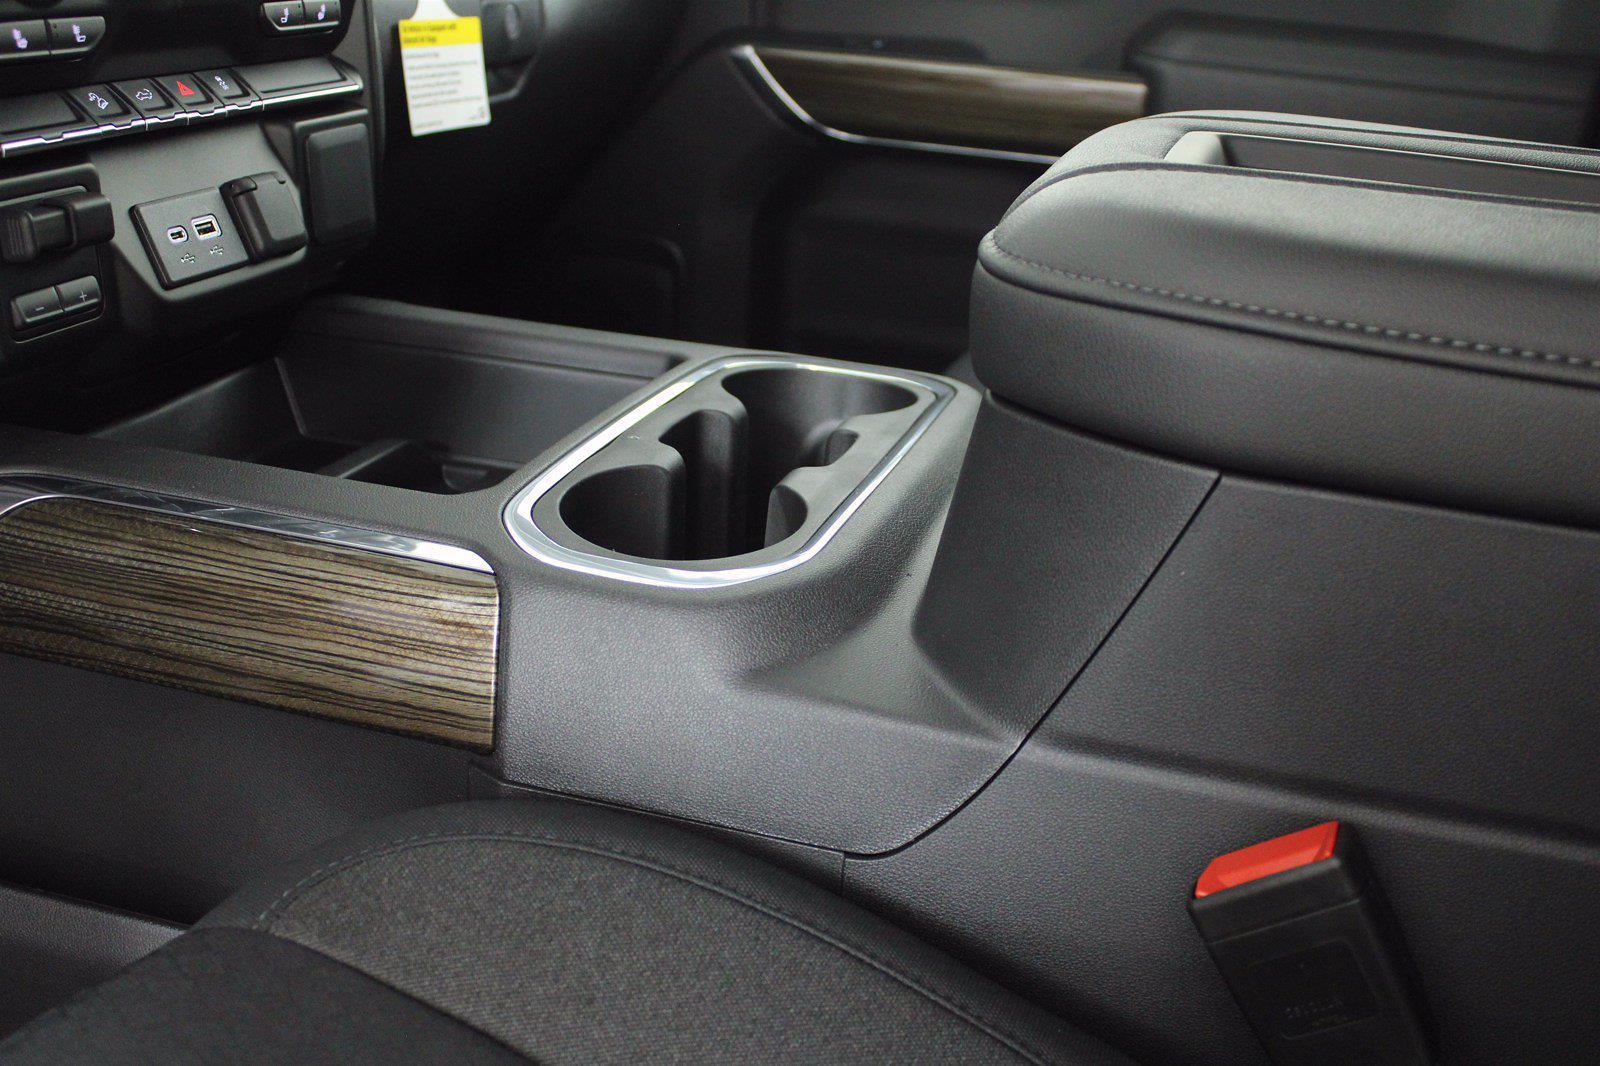 2021 Chevrolet Silverado 1500 Crew Cab 4x4, Pickup #D111114 - photo 12